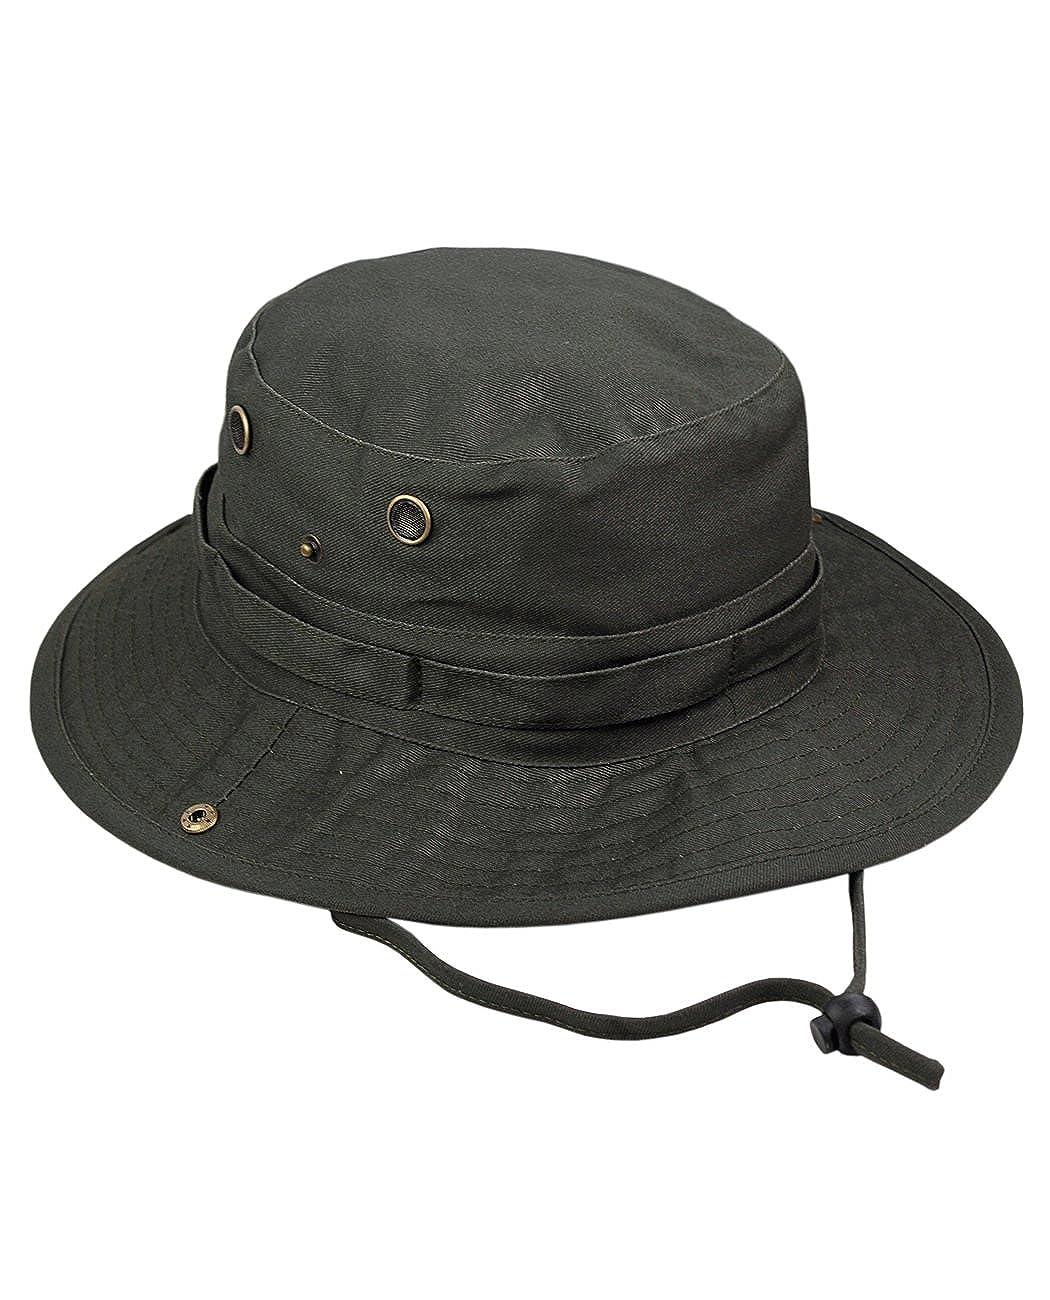 70dc417b036 NYFASHION101 Men s Crushable Snap Brim Cotton Outdoor Bucket Sun Hat Black  OD1890-BK